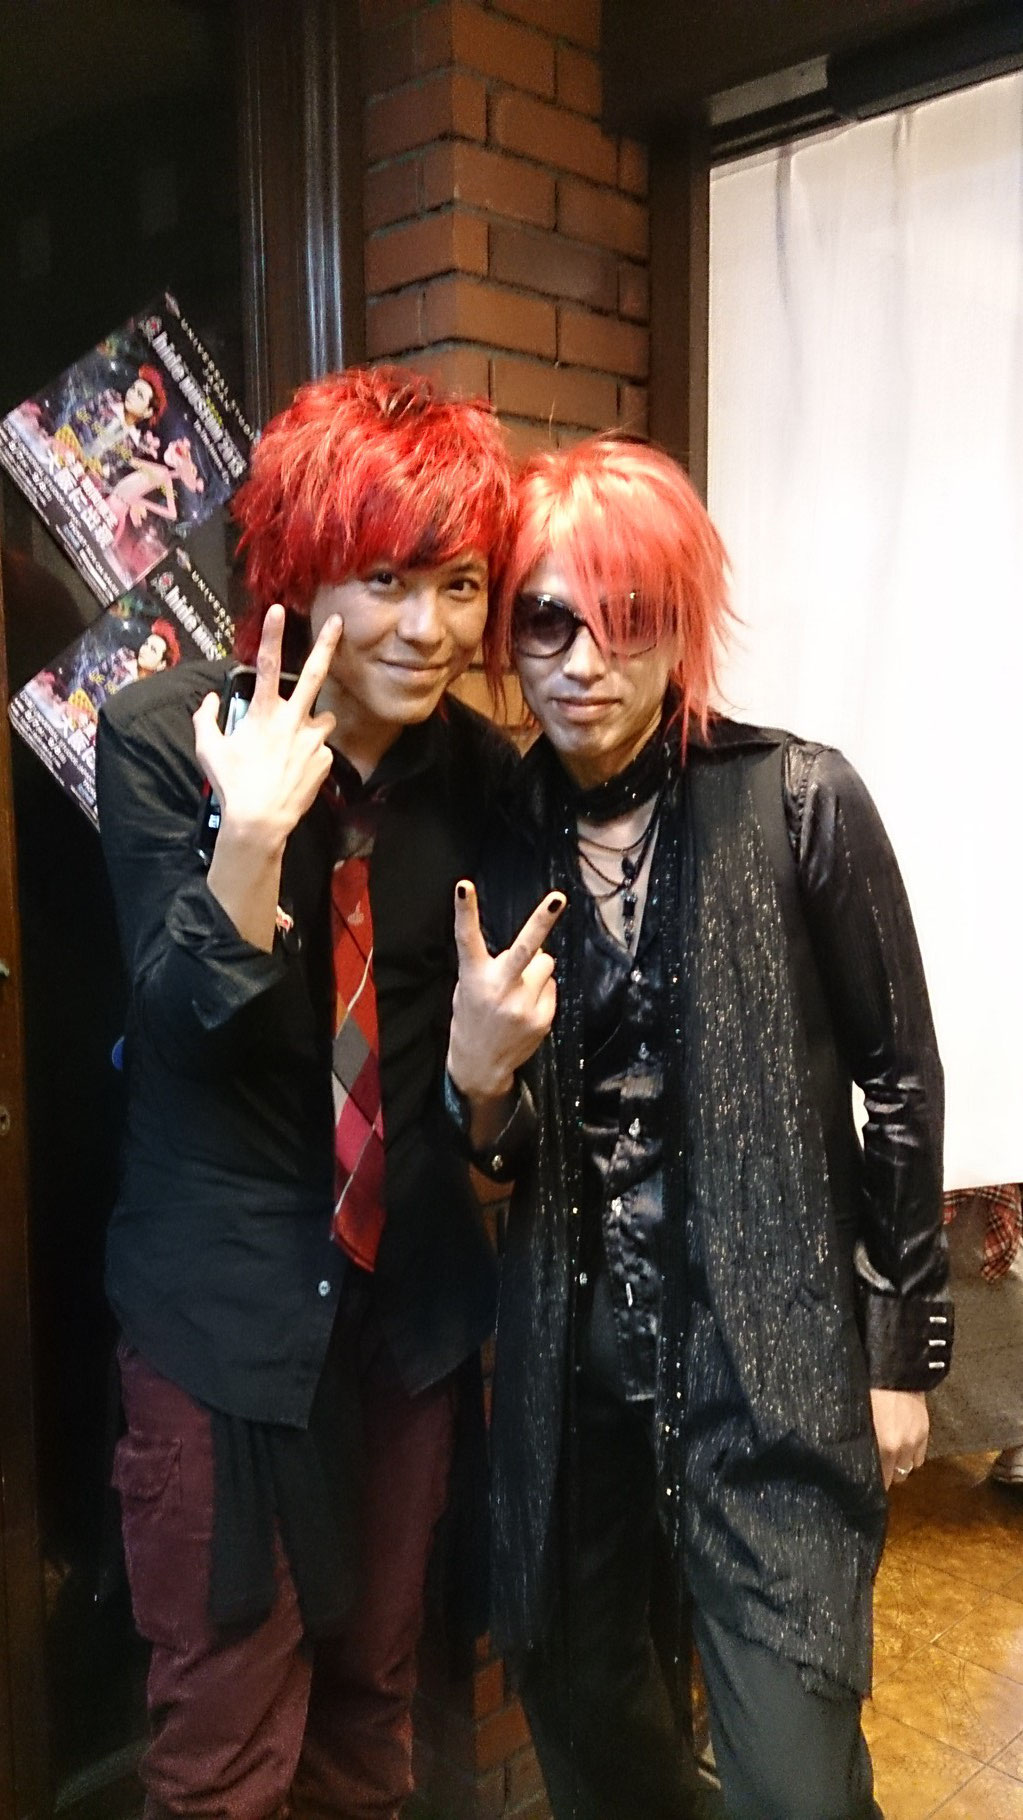 VocalのRYOさんと記念写真(^-^)